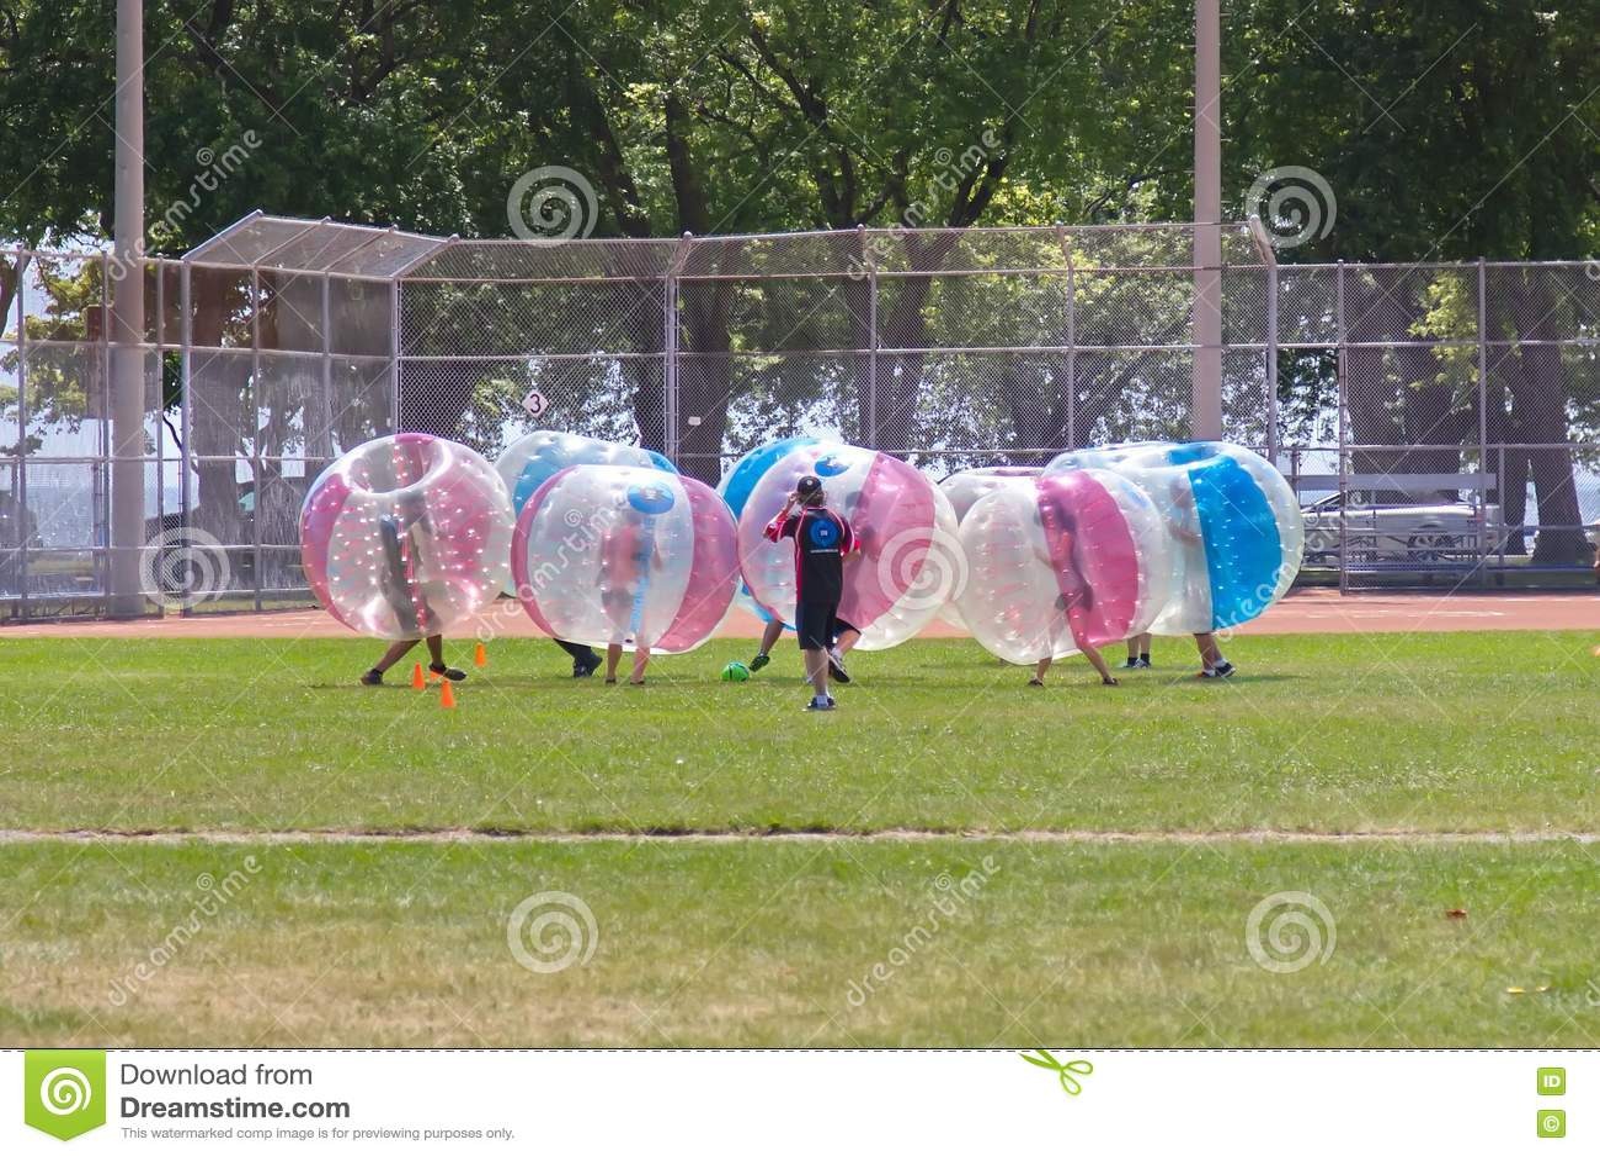 Bubble Madness